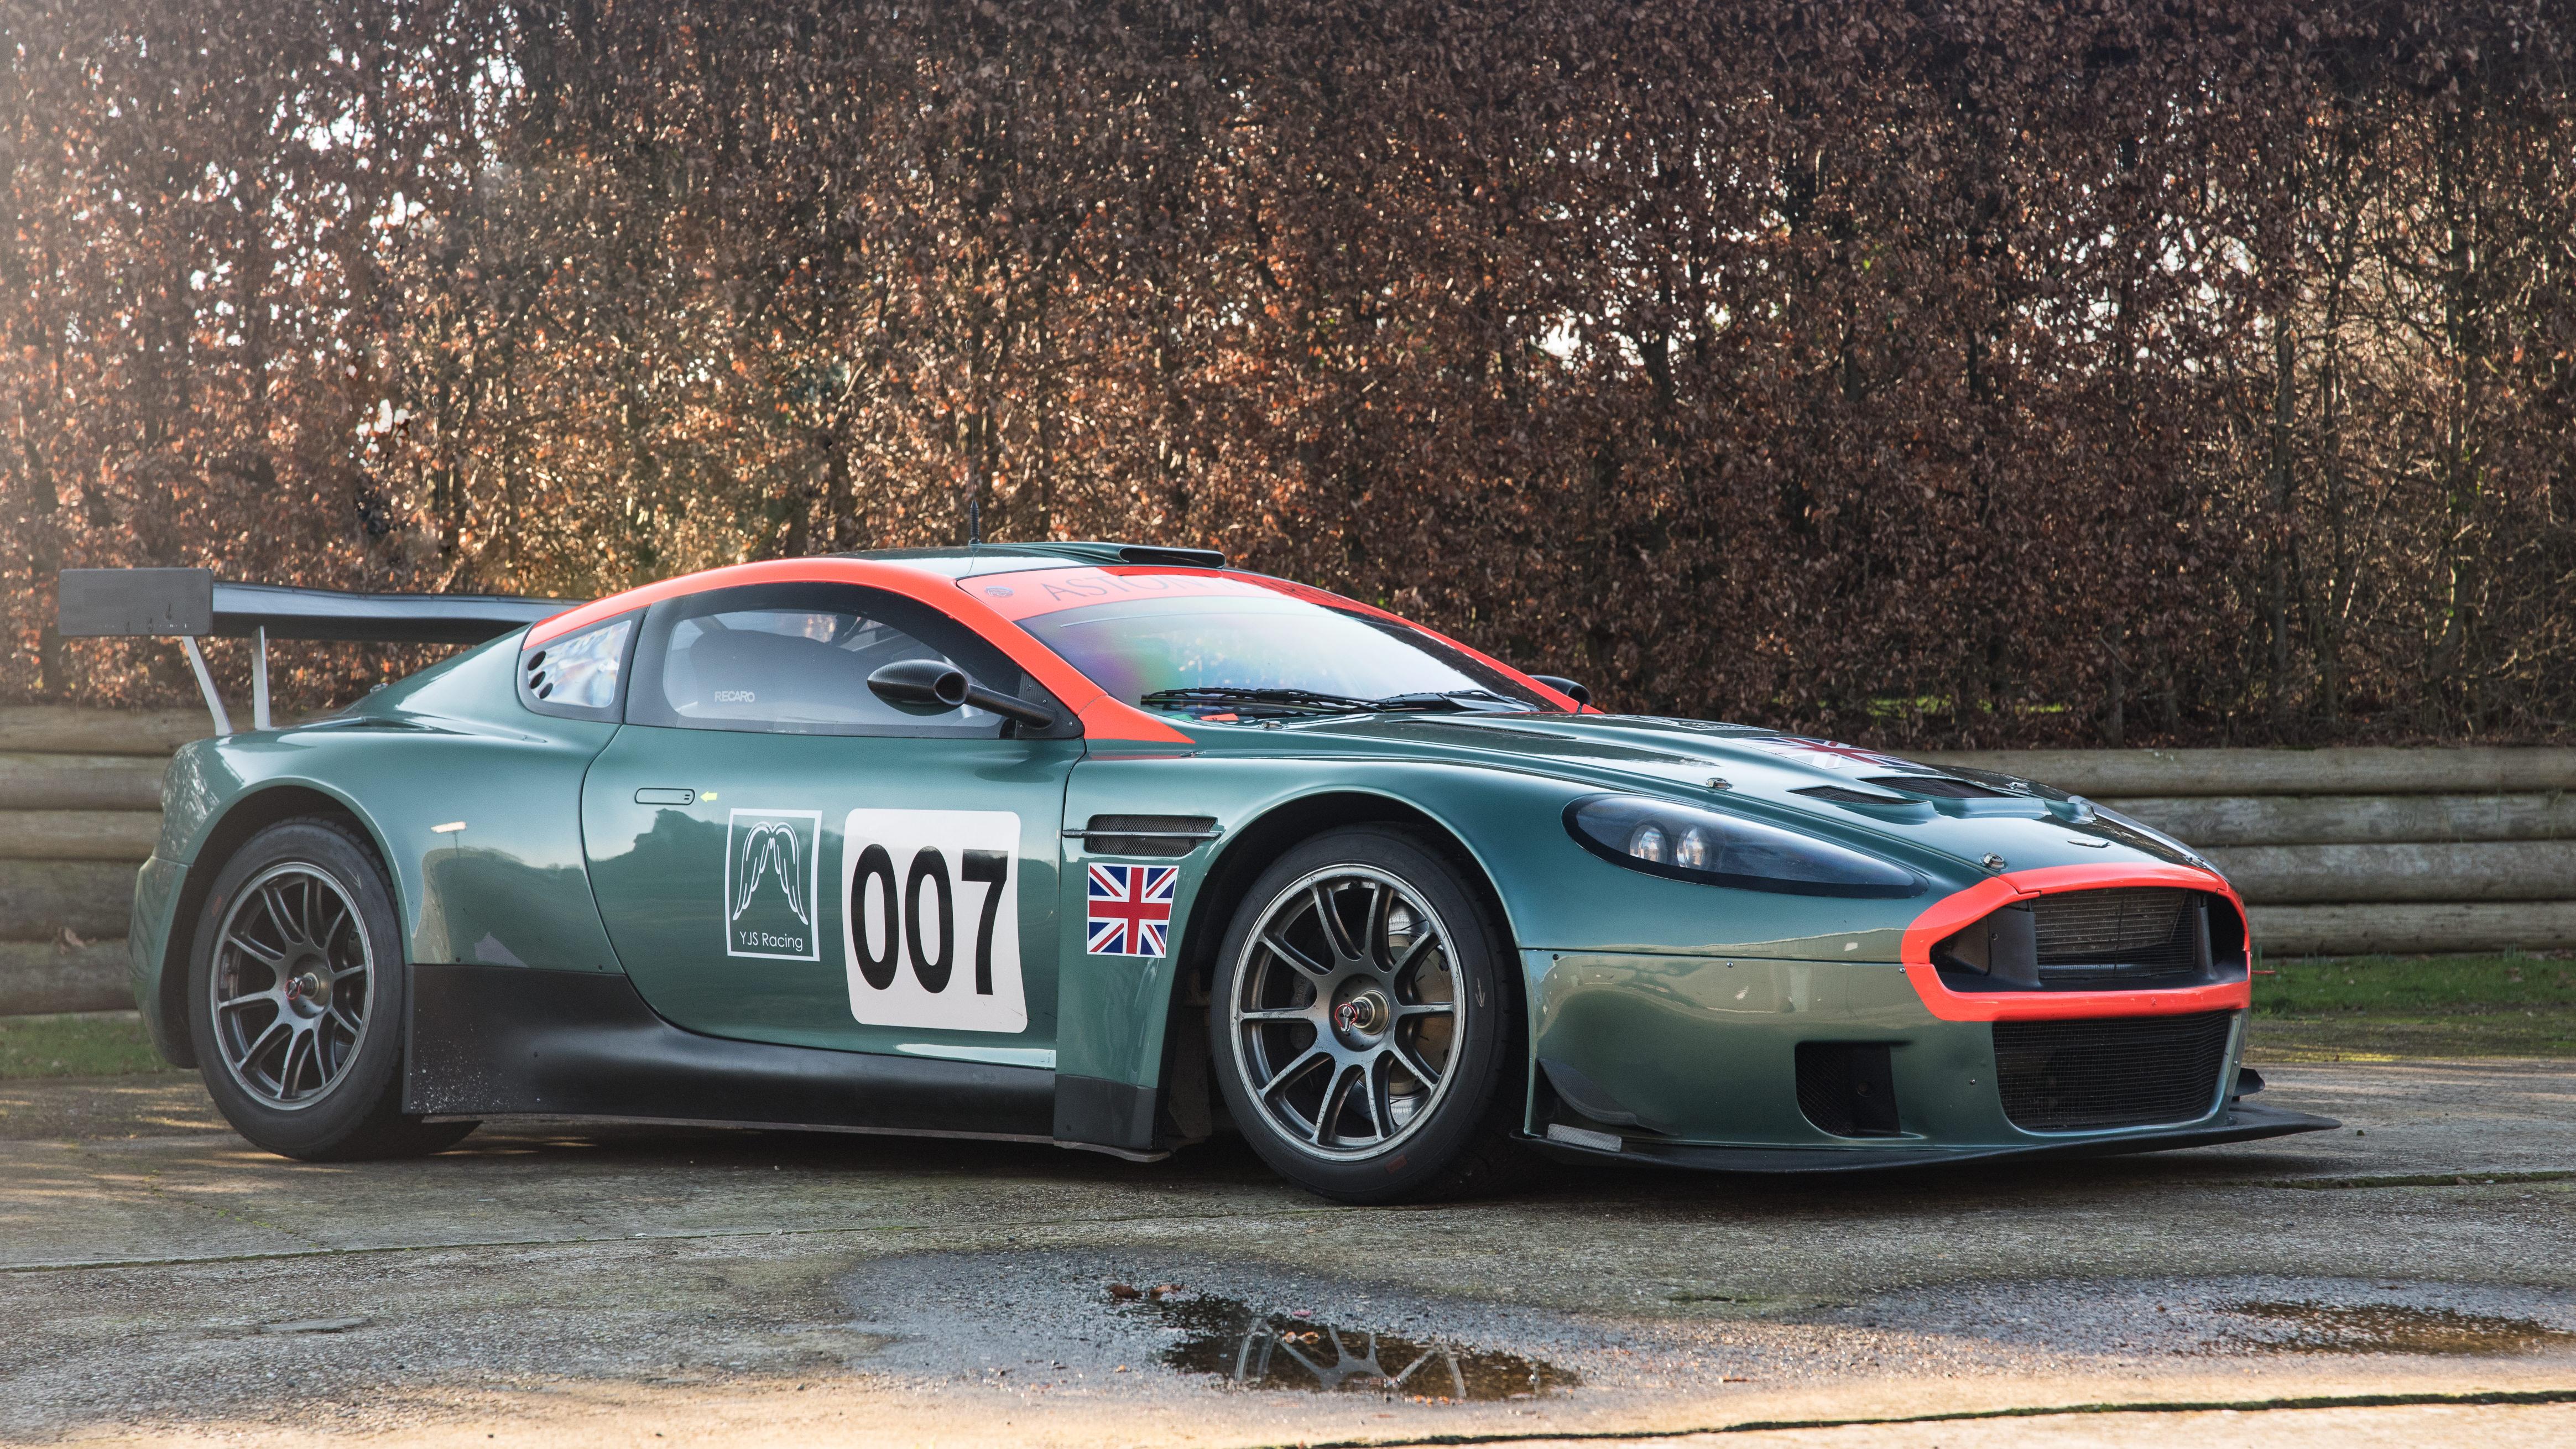 2006 Aston Martin Dbrs9 Dylan Miles